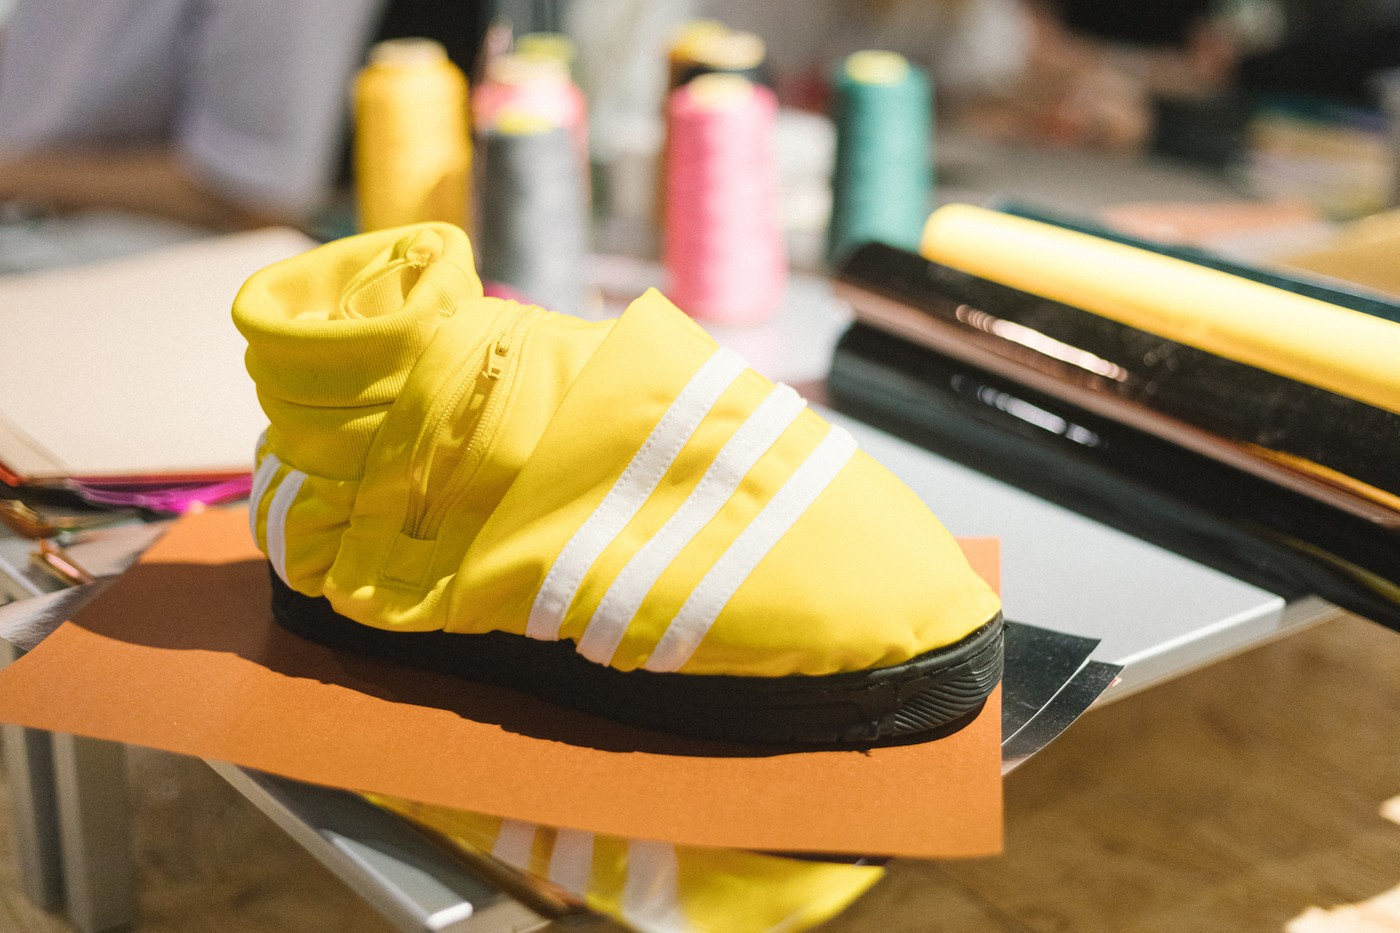 https___hypebeast.com_wp-content_blogs.dir_6_files_2019_07_hypebae-adidas-shanghai-workshop-5.jpg